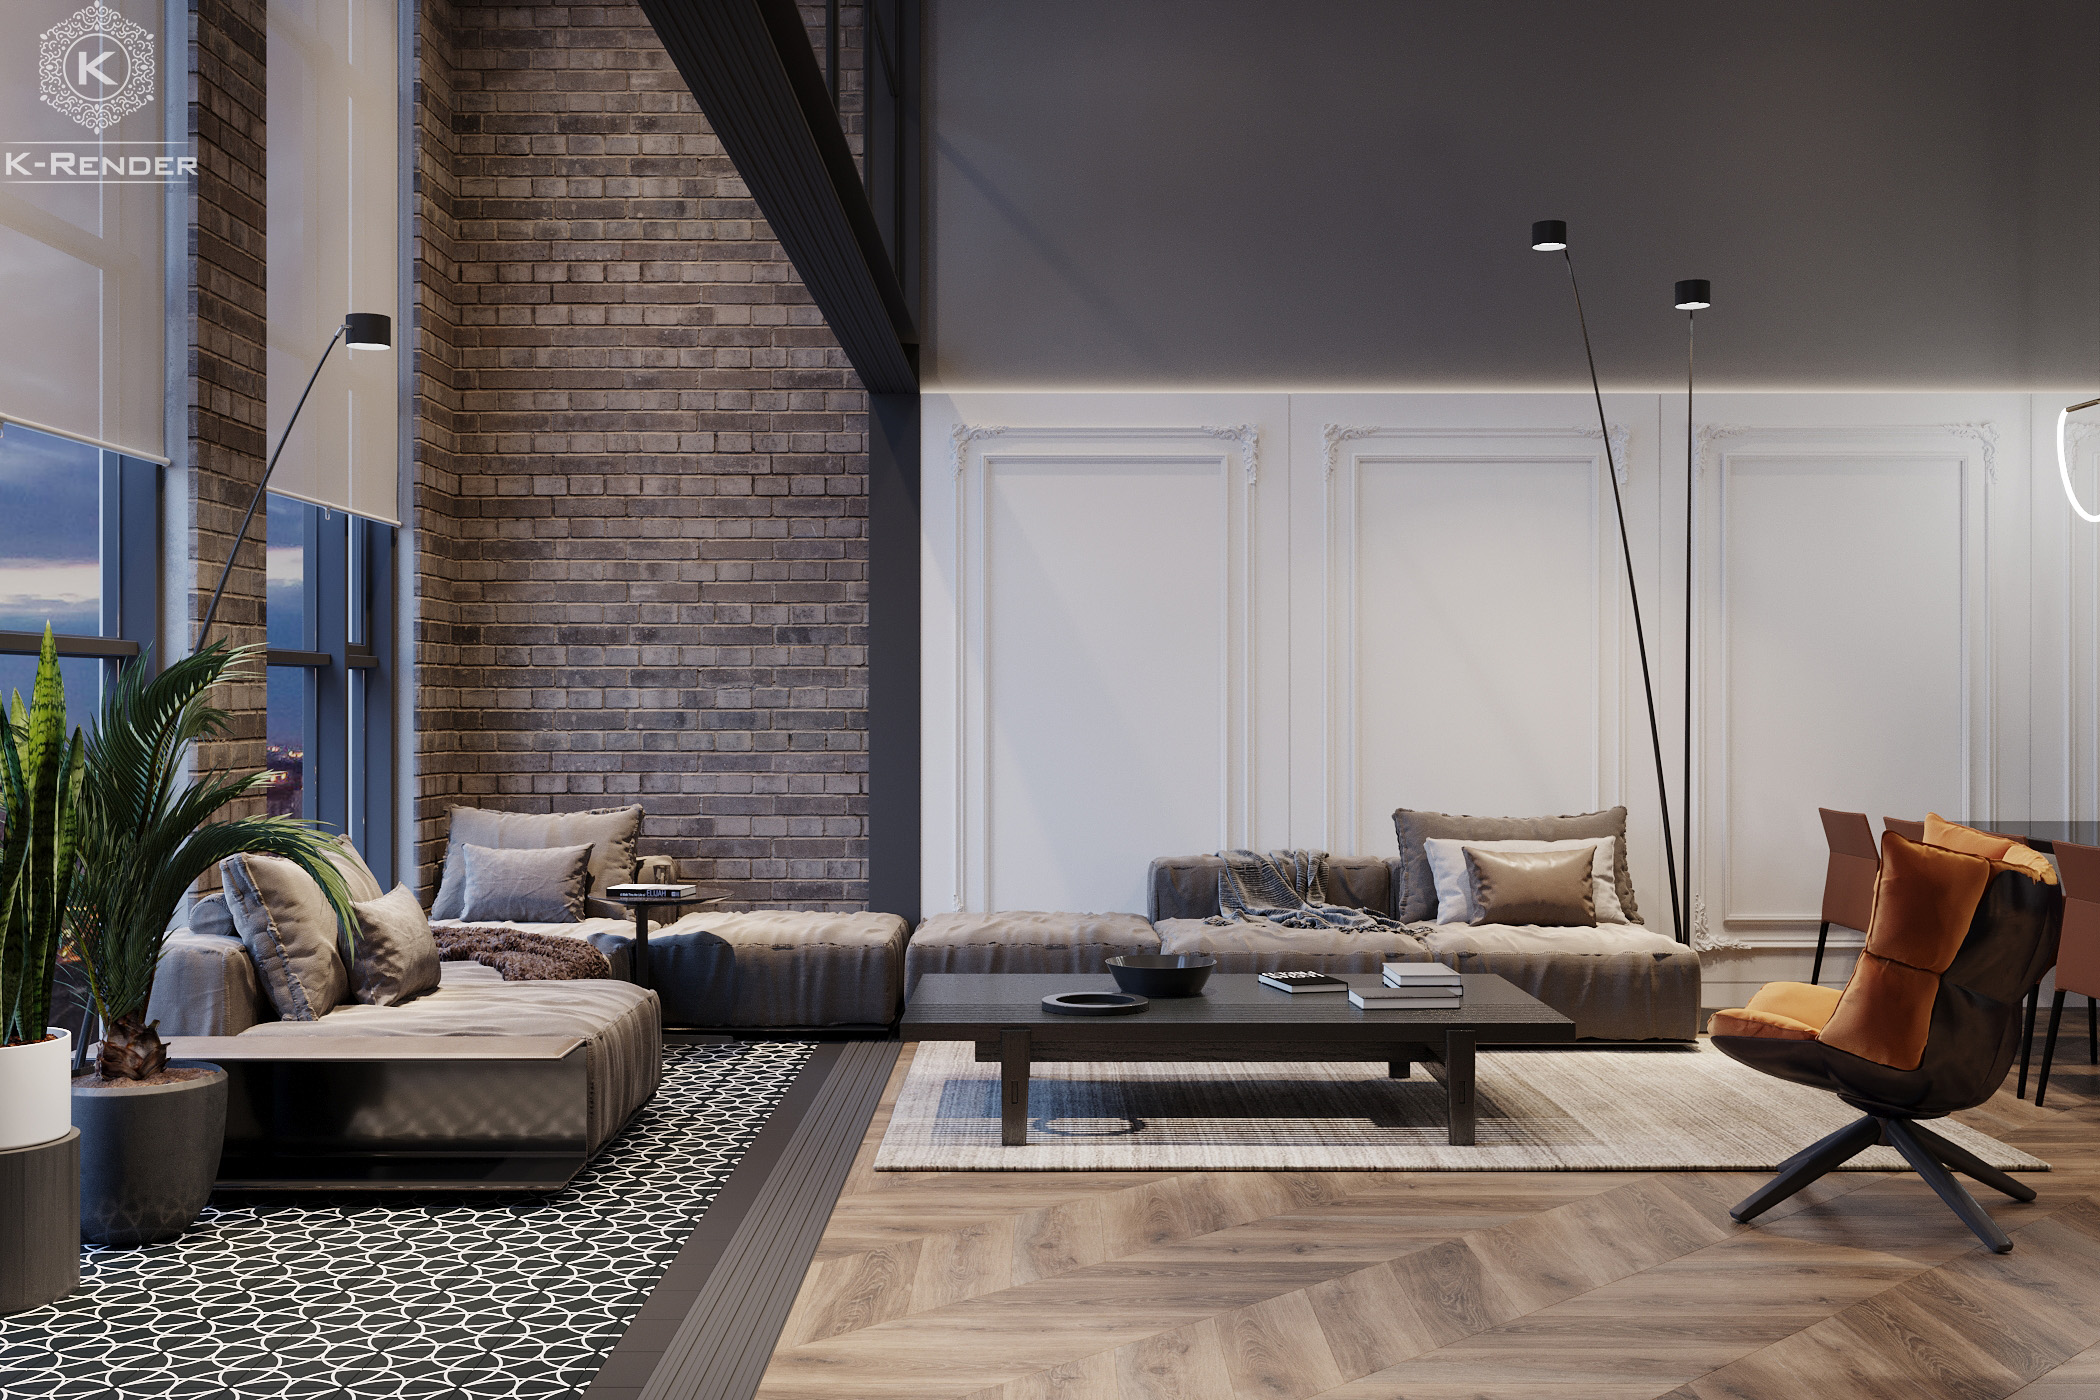 sunshine-apartment-k-render-studio-3d-rendering-studio